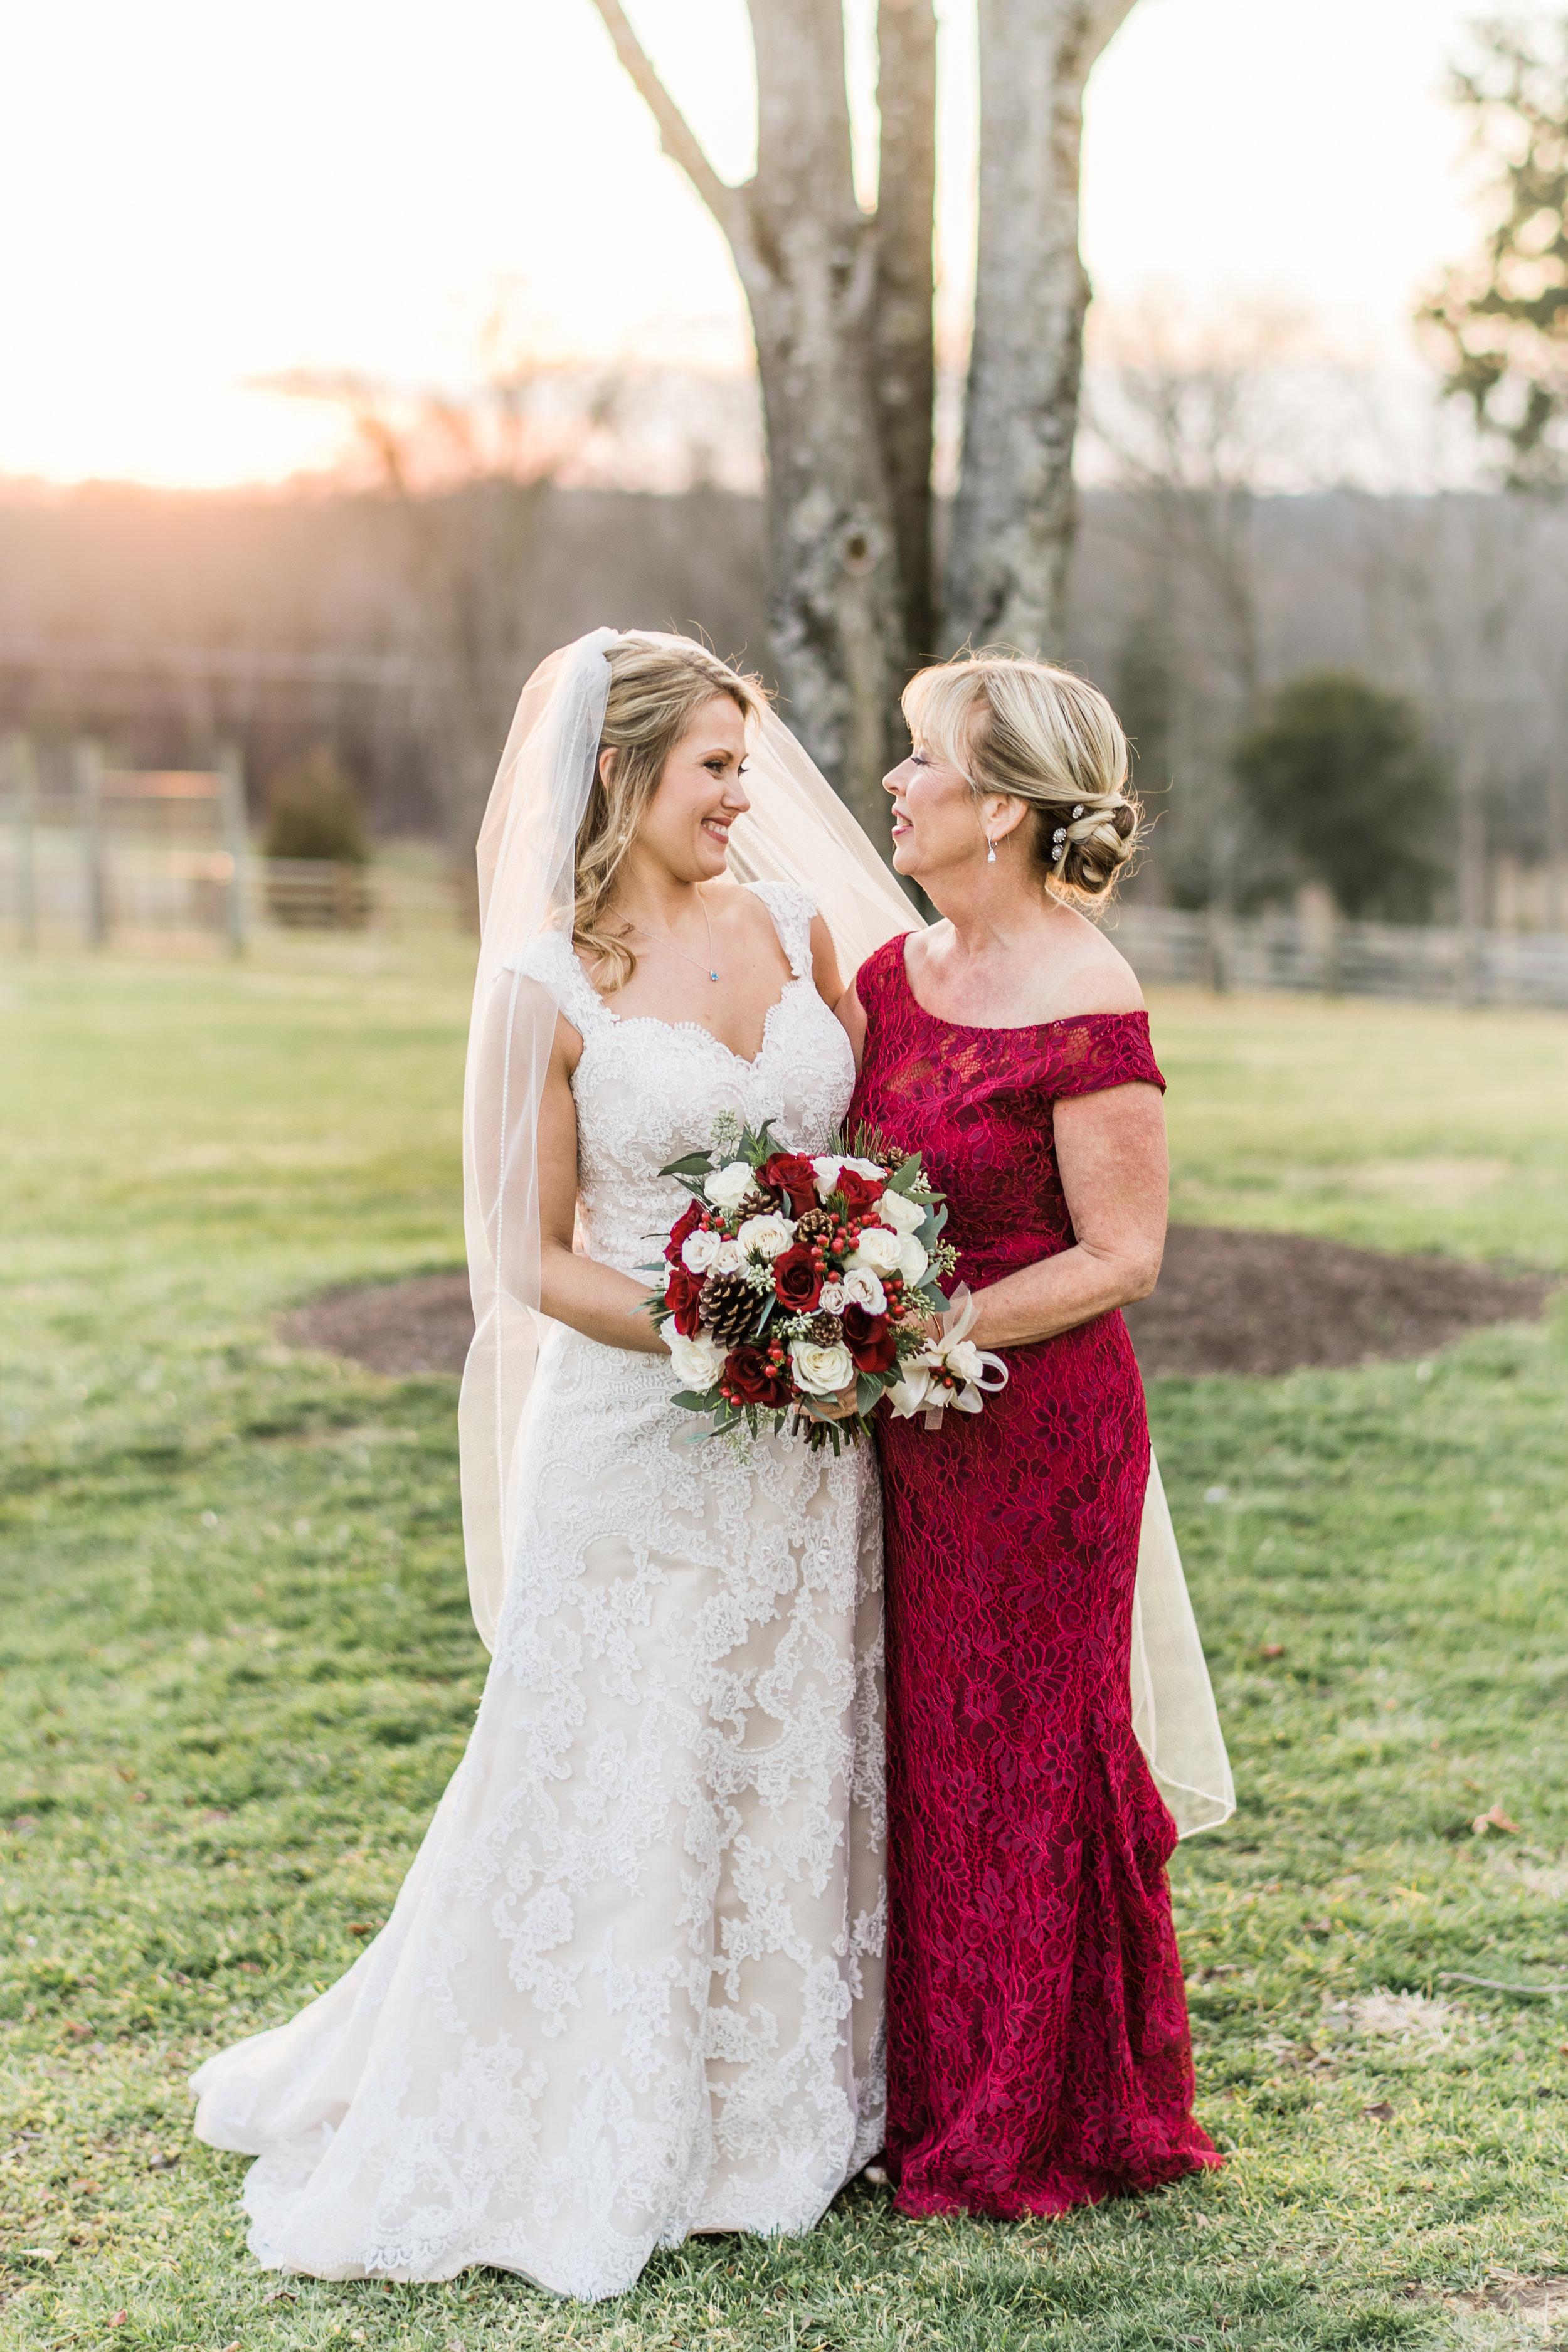 6-123018 VA Laura Ryder + Danny - Stephanie Messick Photgraphy EP-laurie-the-winery-at-bull-run-virginia-wedding-photographer-1.jpg